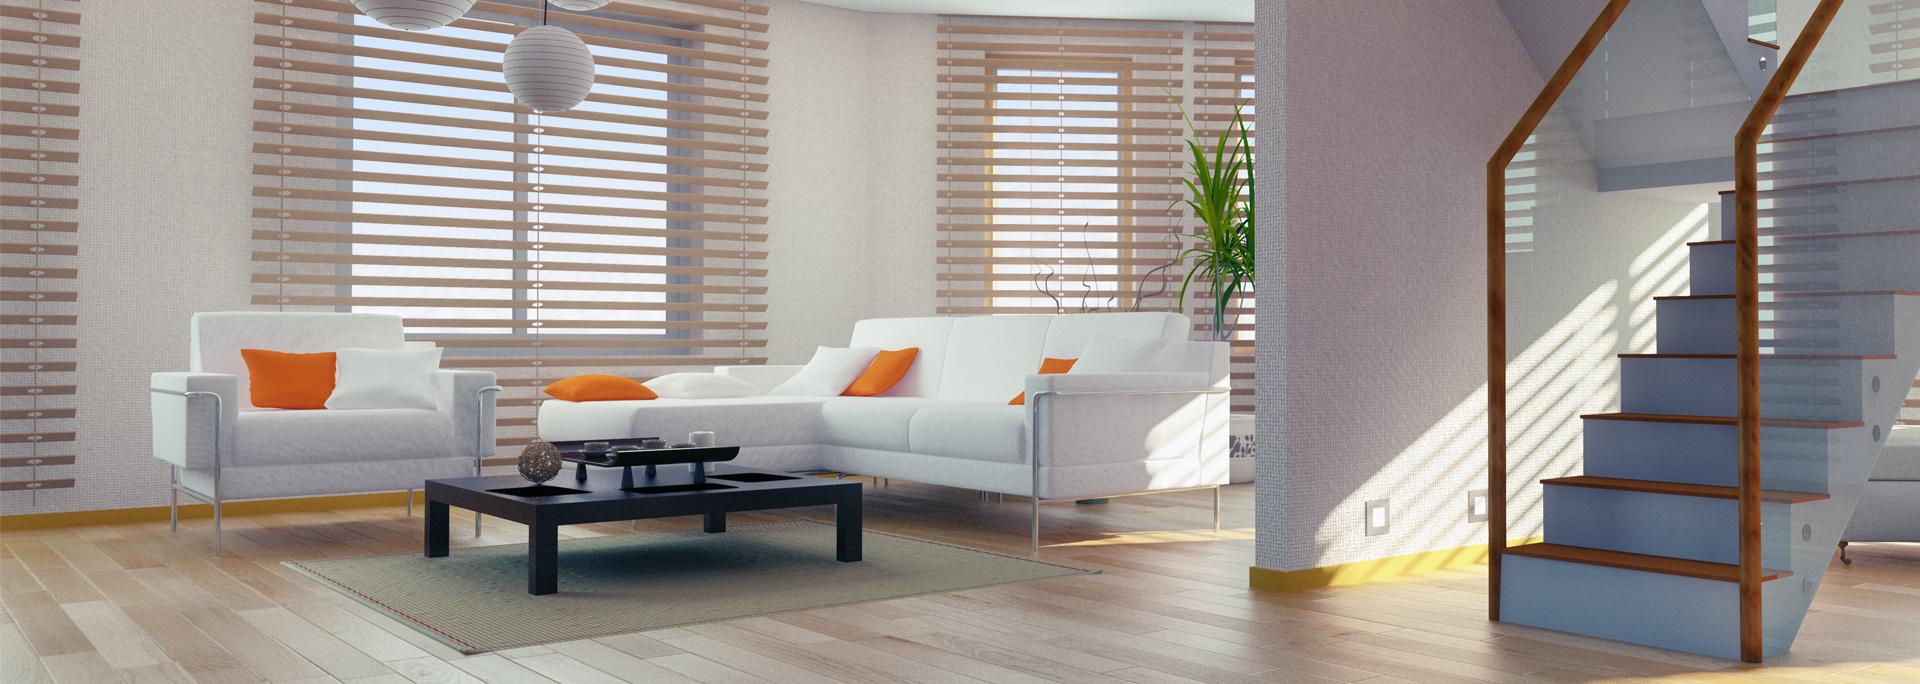 maison perpignan sud ventana blog. Black Bedroom Furniture Sets. Home Design Ideas